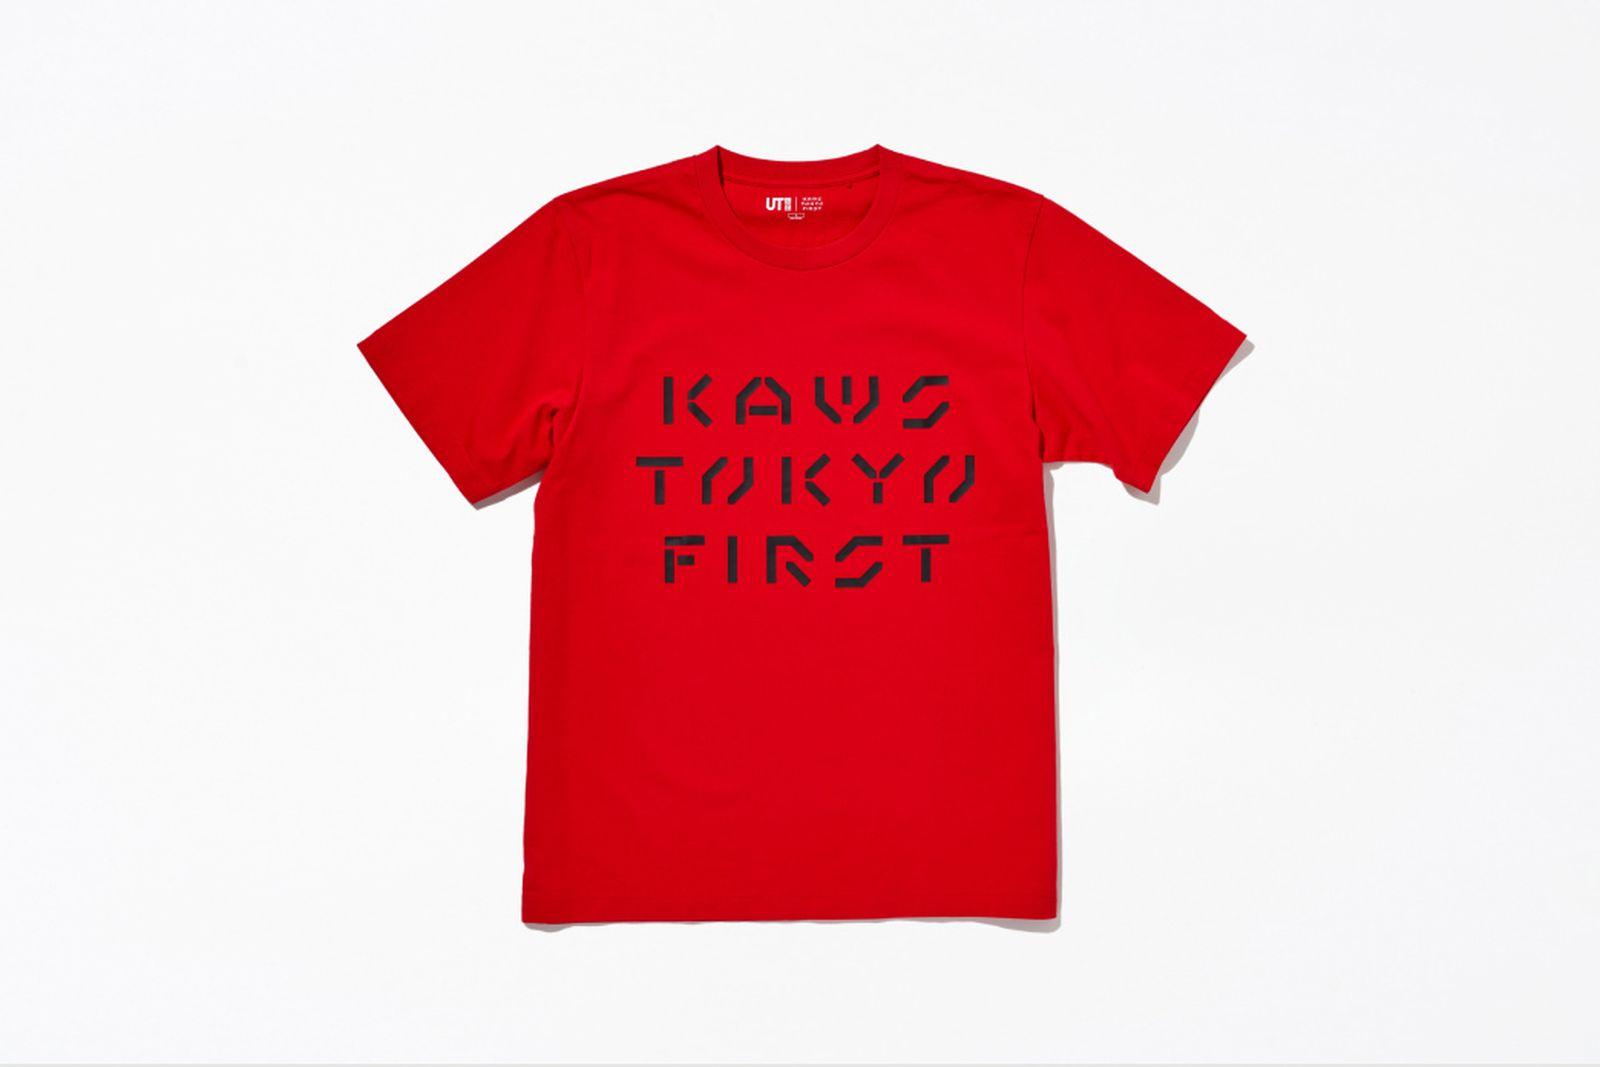 kaws tokyo first uniqlo ut companion tee shirt buy release date info